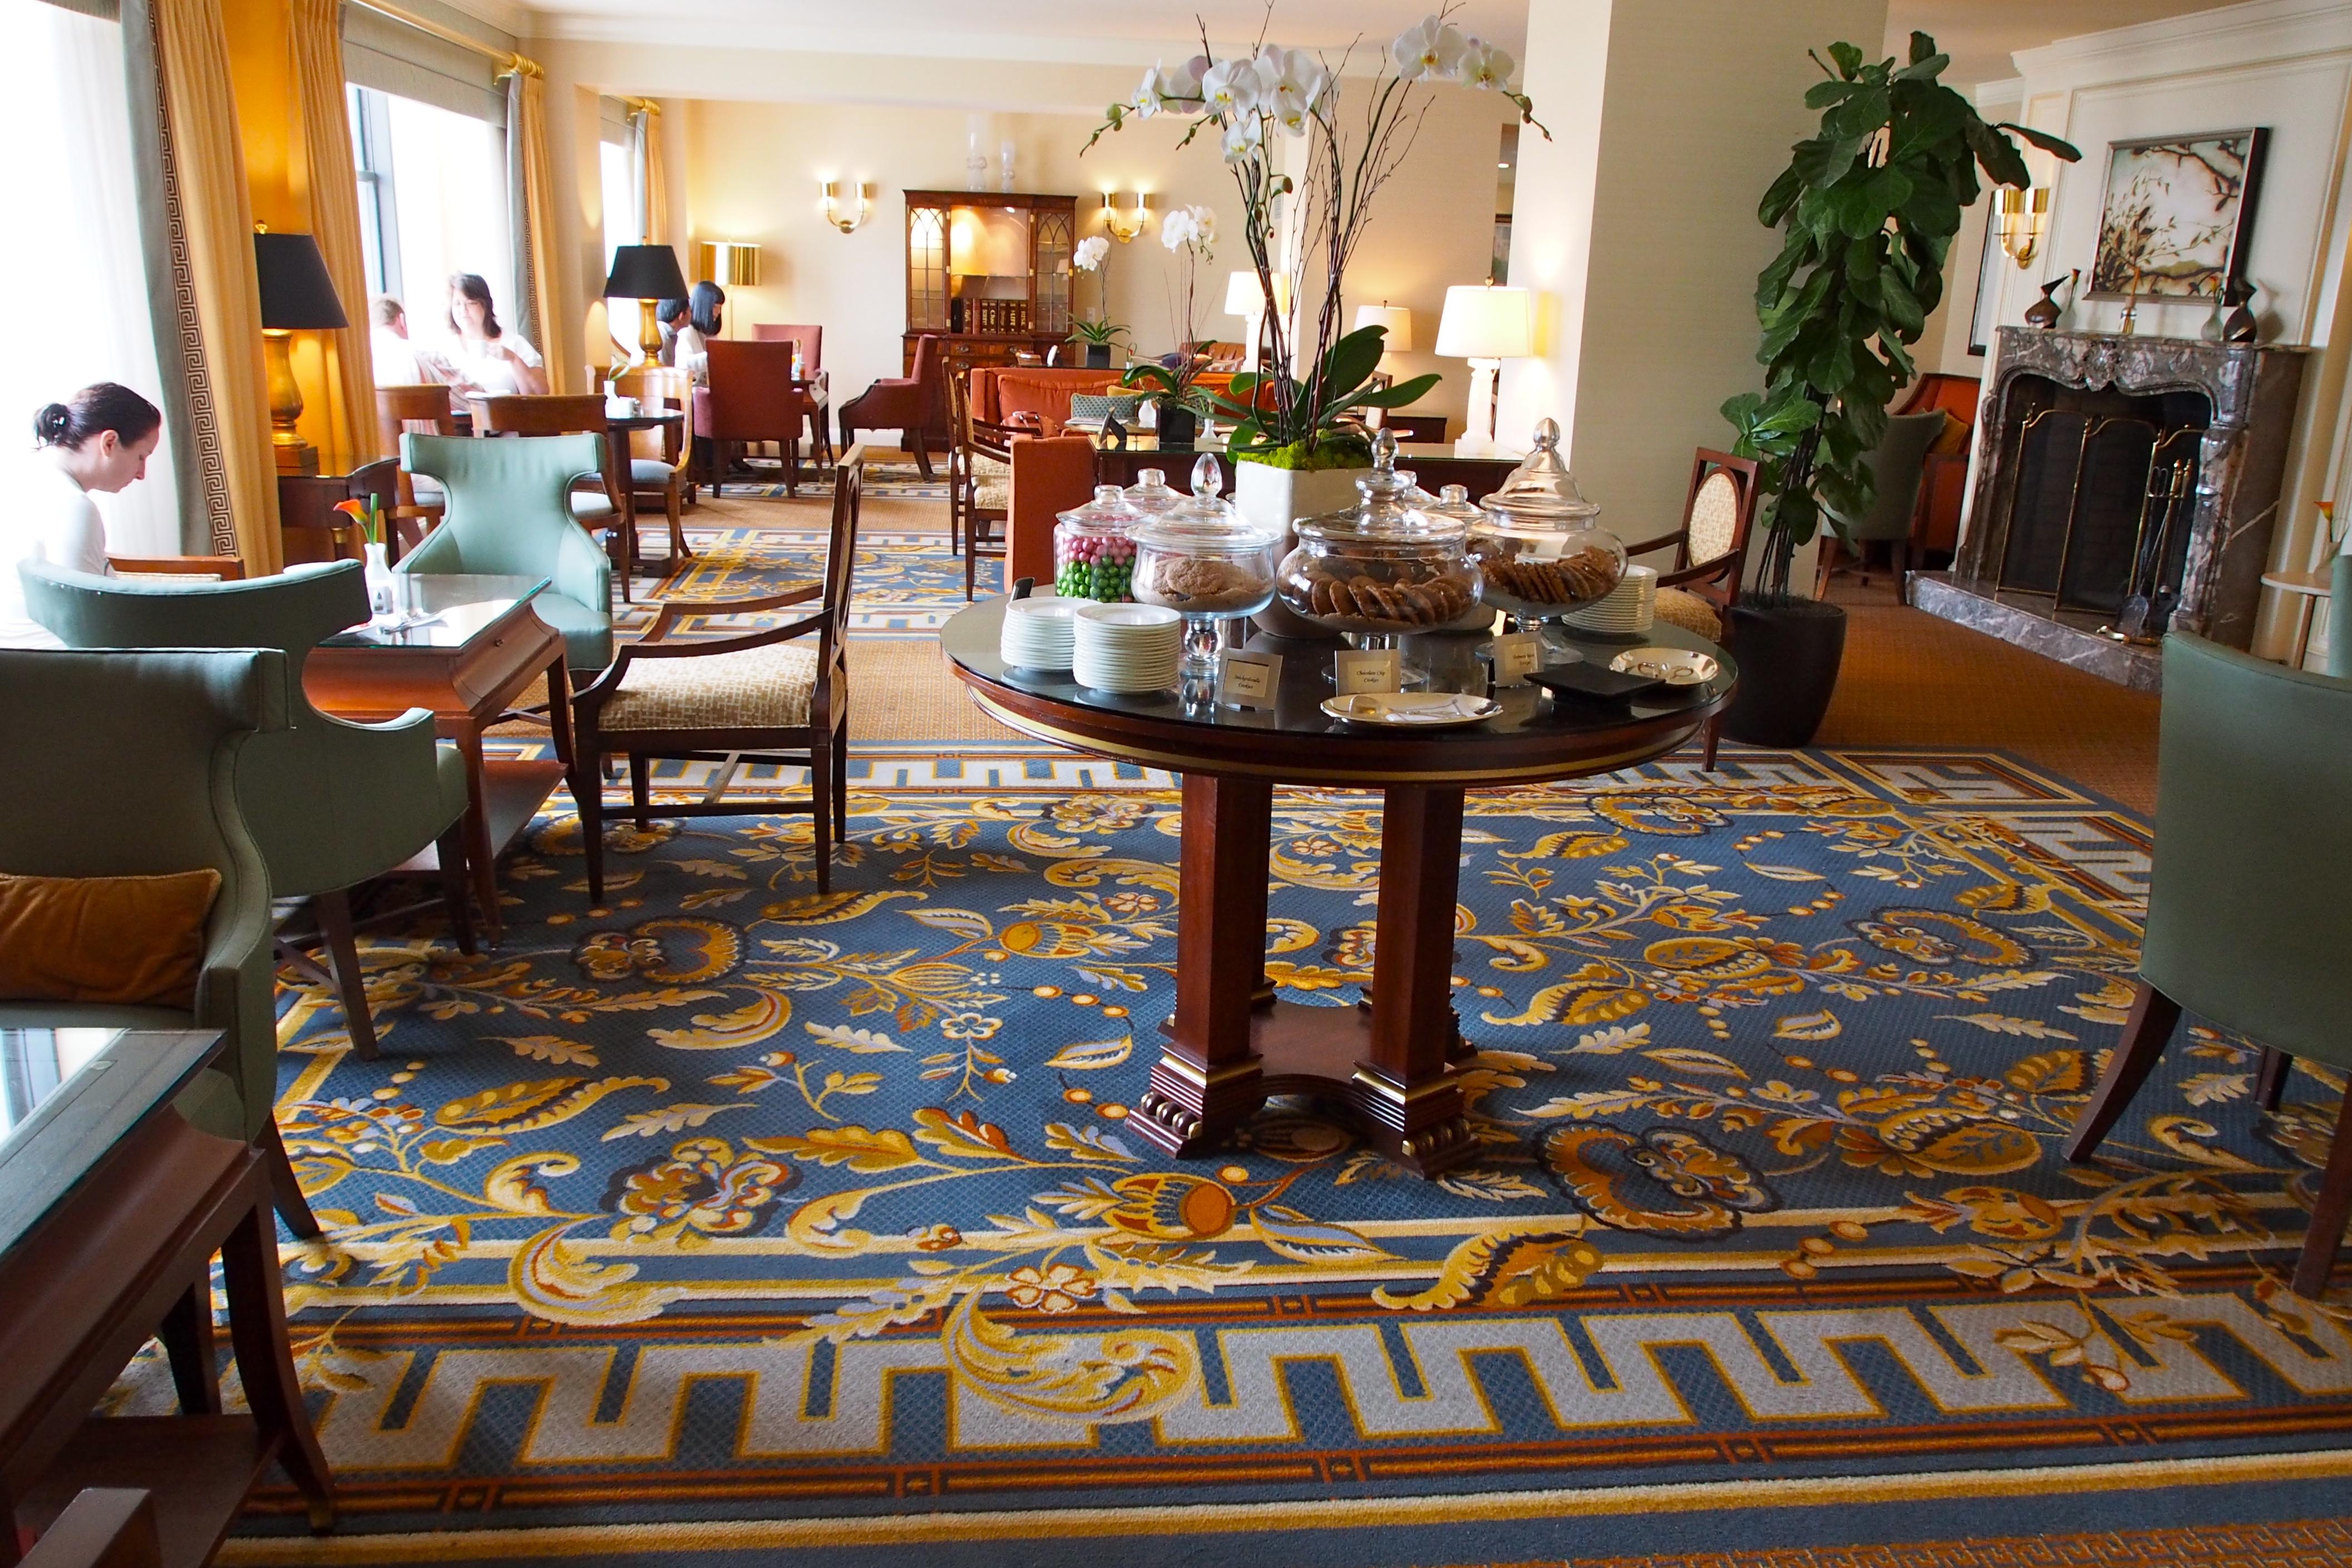 ritz carlton hotel san francisco john pond hotel. Black Bedroom Furniture Sets. Home Design Ideas